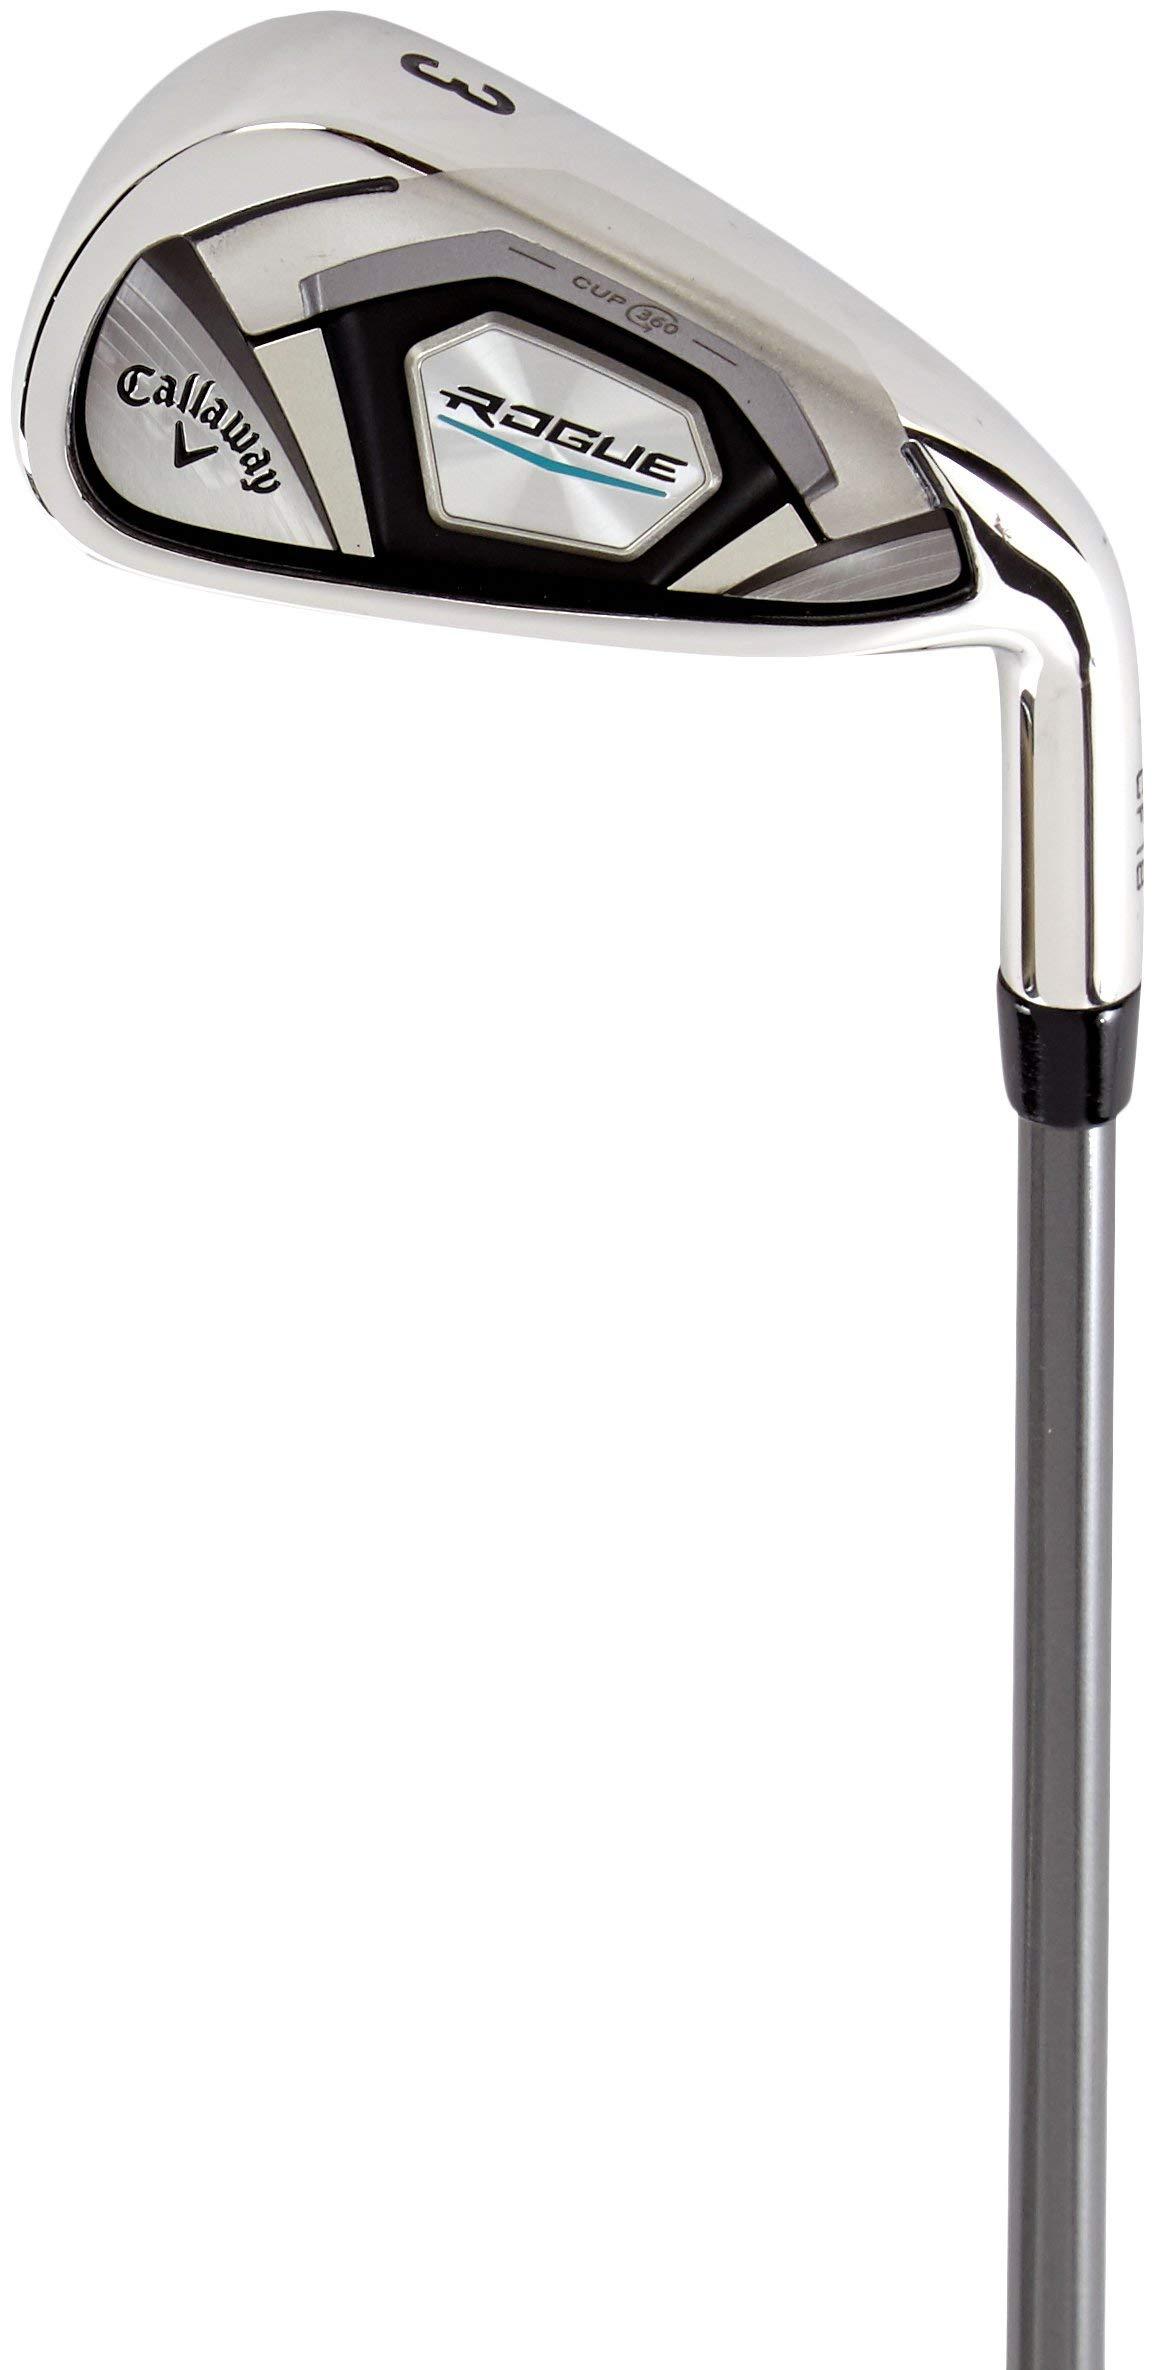 Callaway Rogue 7 Iron, Graphite, Regular (Renewed) by Callaway Golf